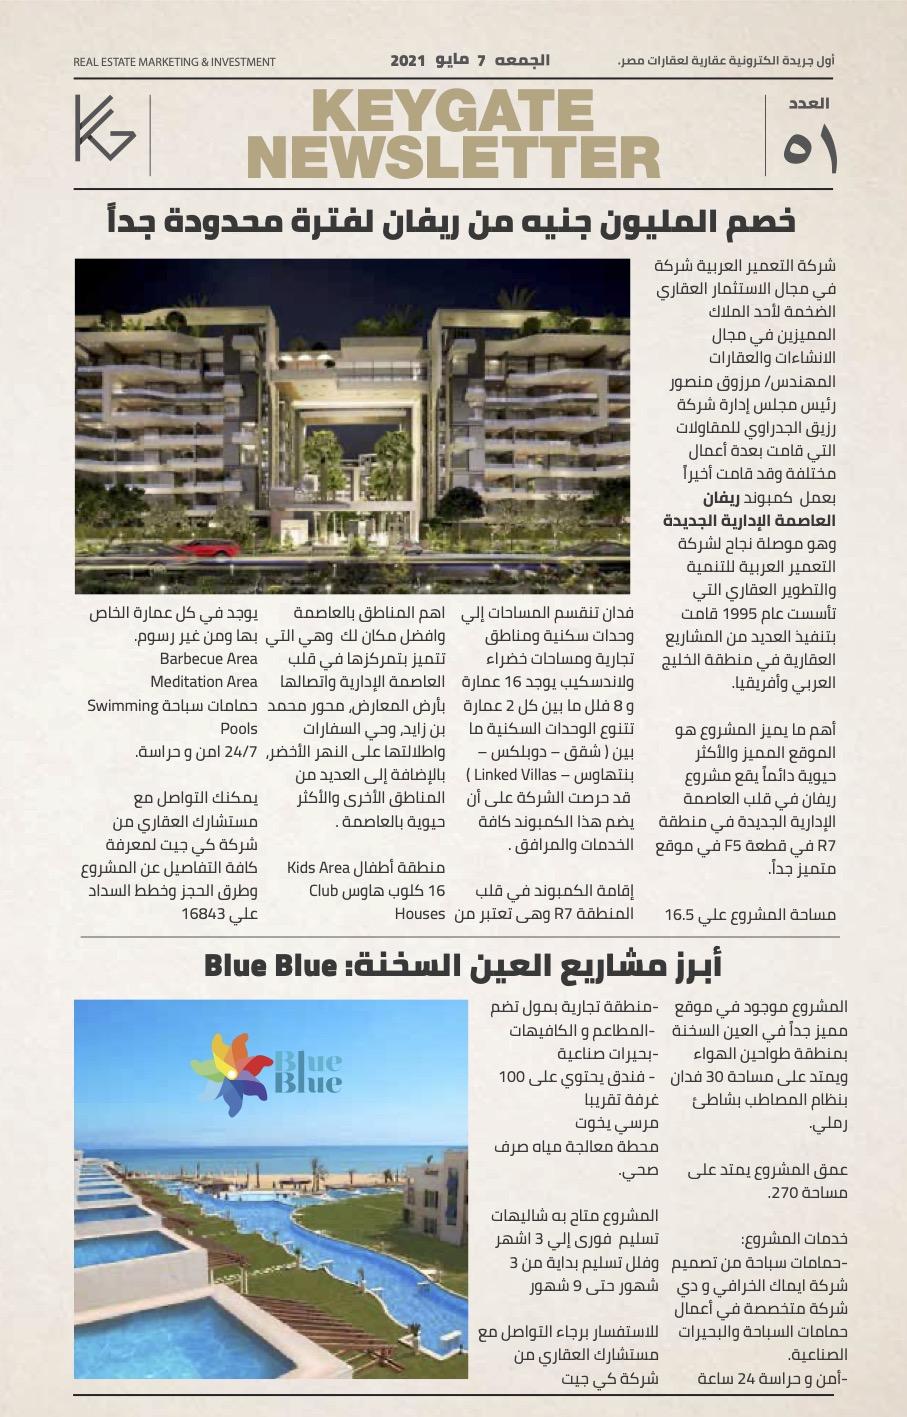 KeyGate Real Estate' Newspaper 8-5-2021 1.0